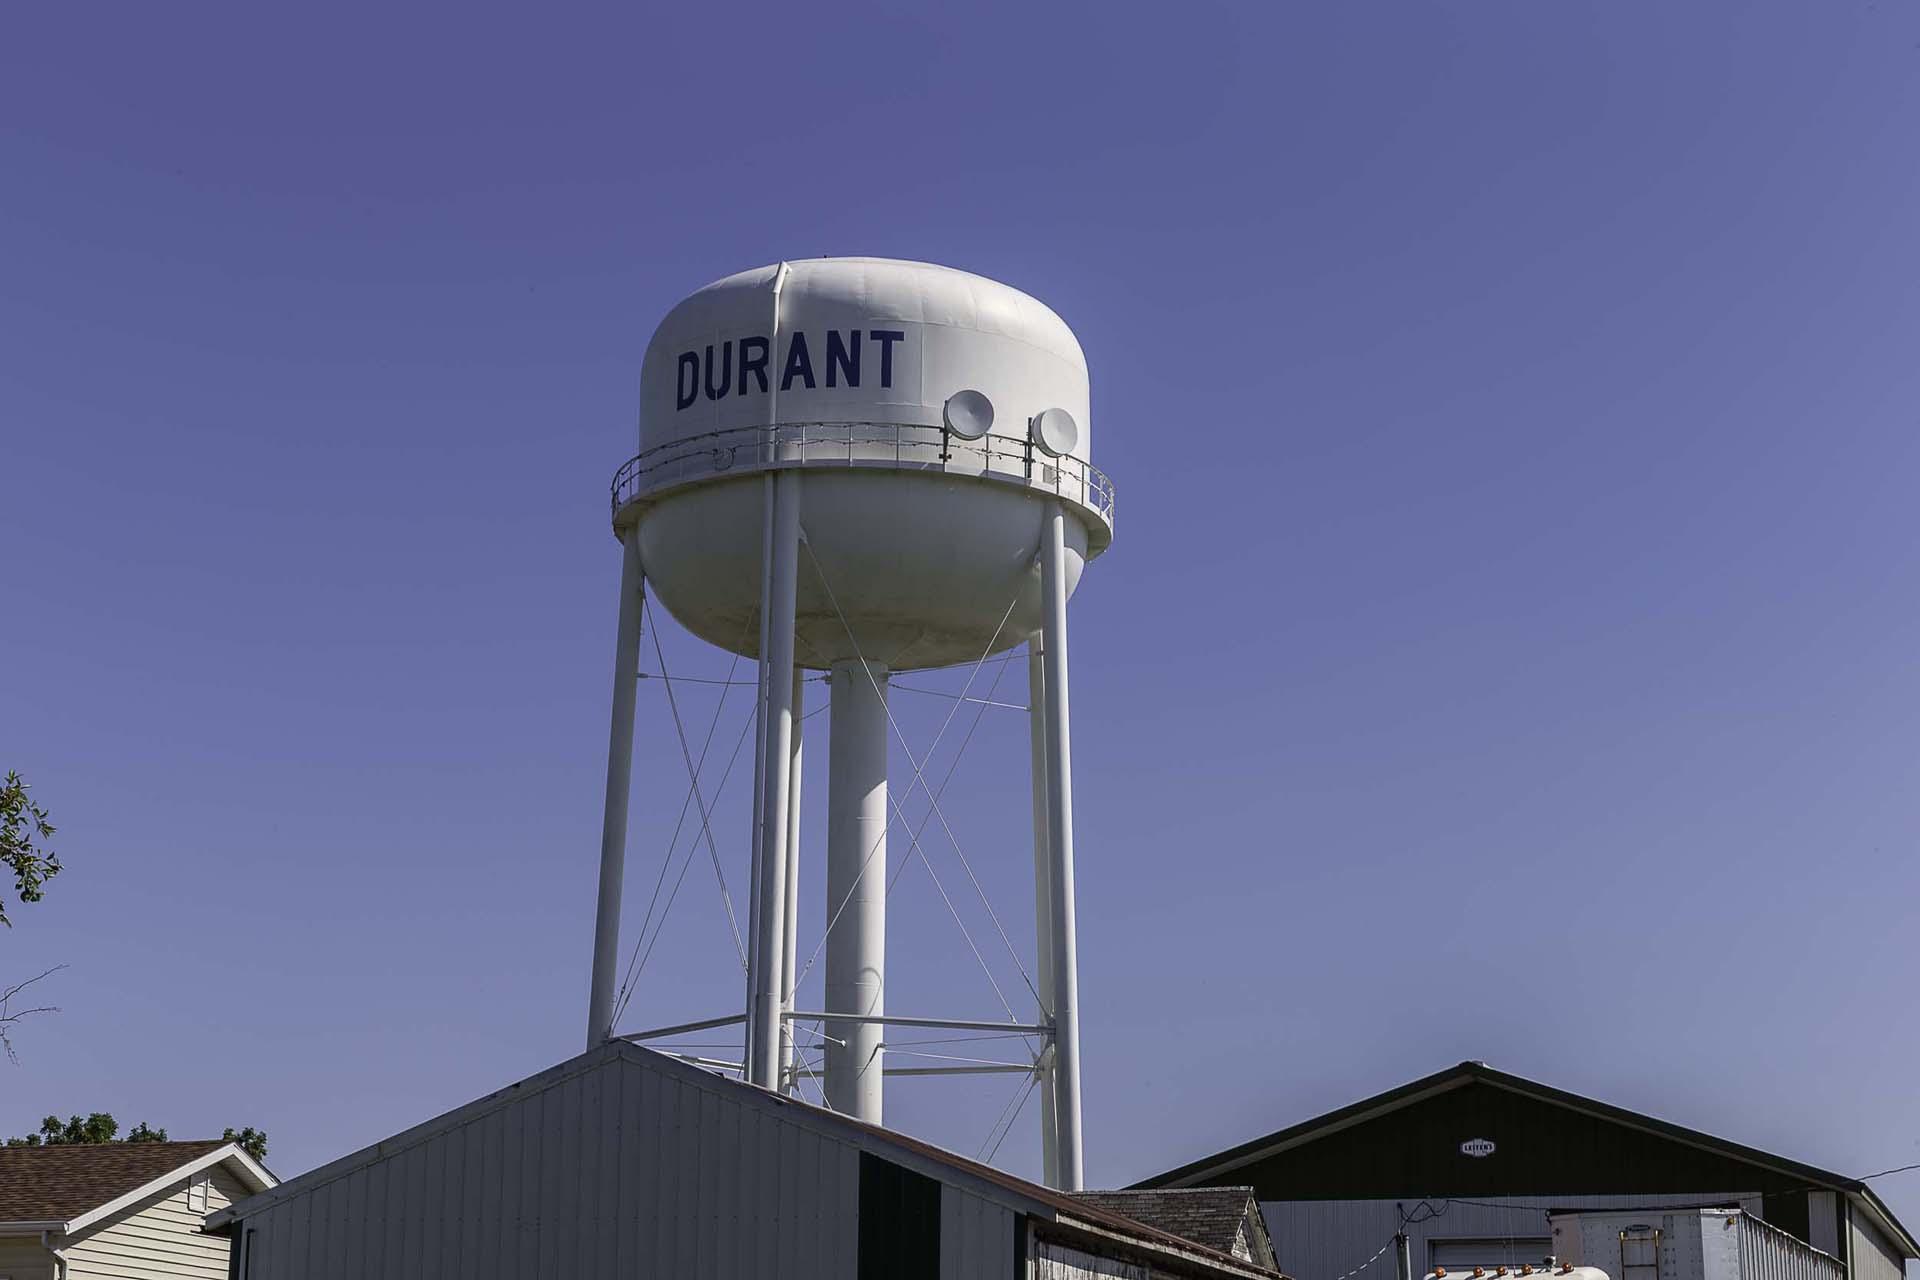 Durant, Iowa City Services